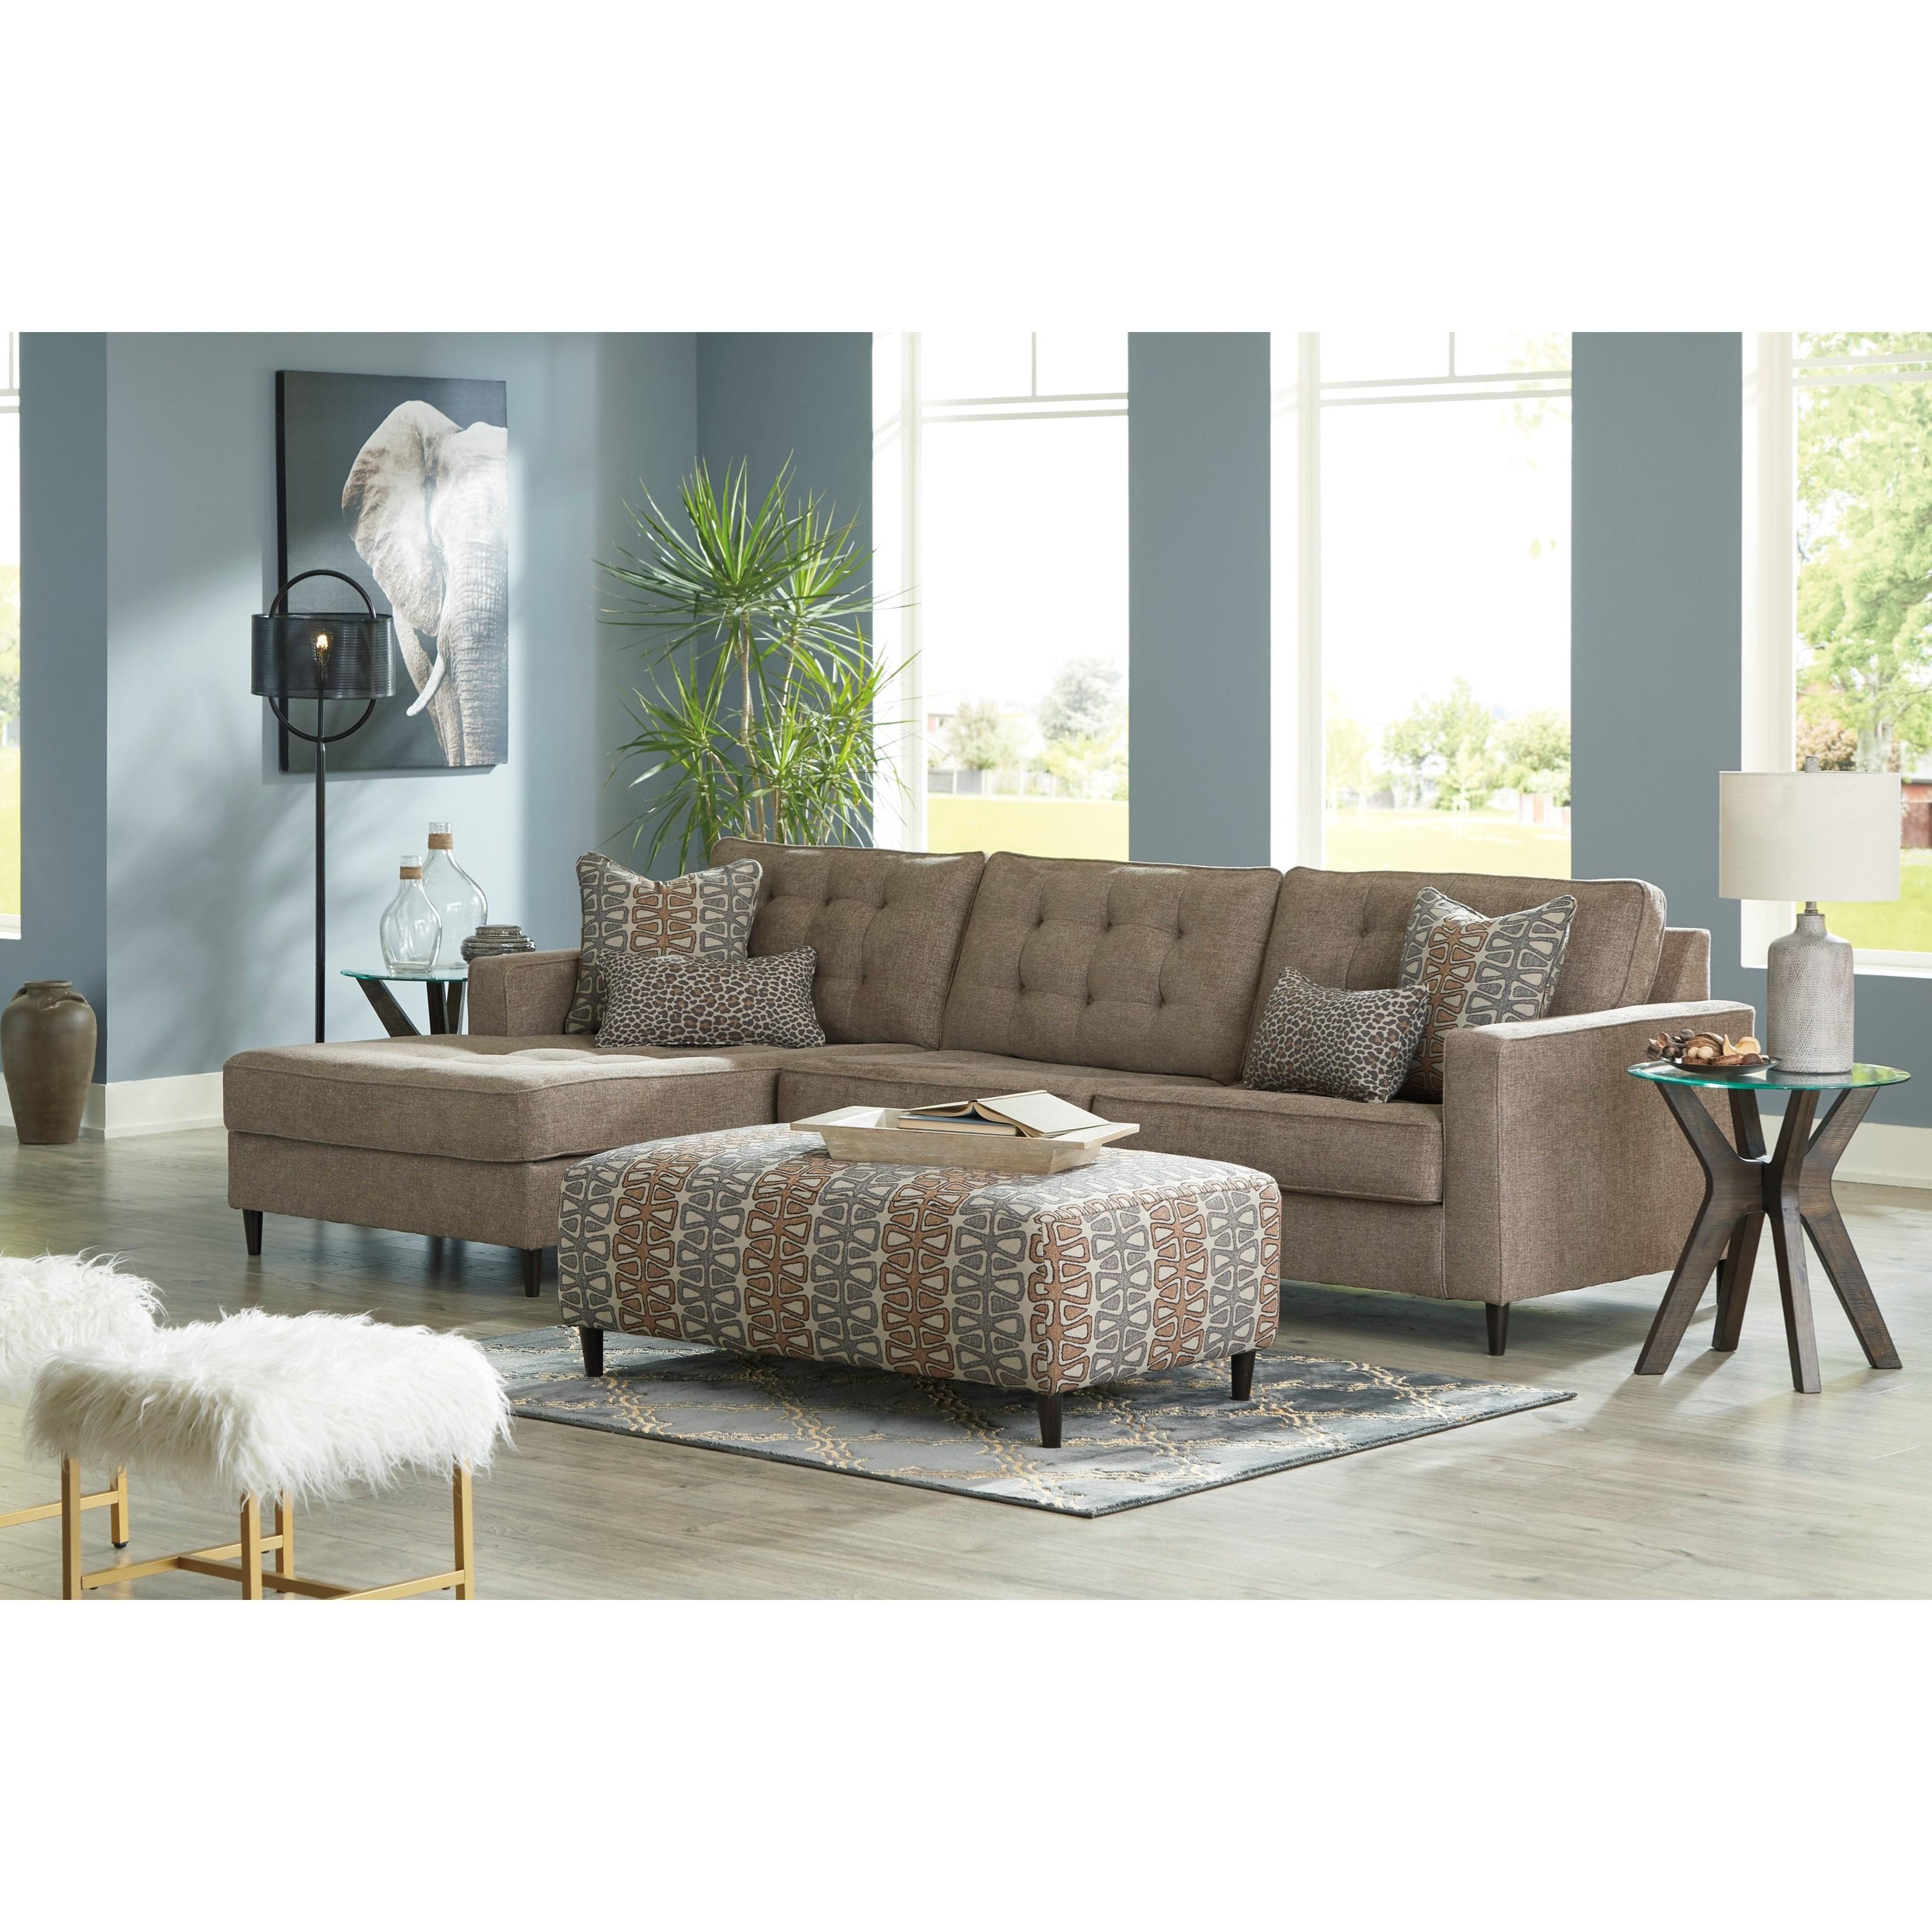 Flintshire Living Room Group by Ashley (Signature Design) at Johnny Janosik